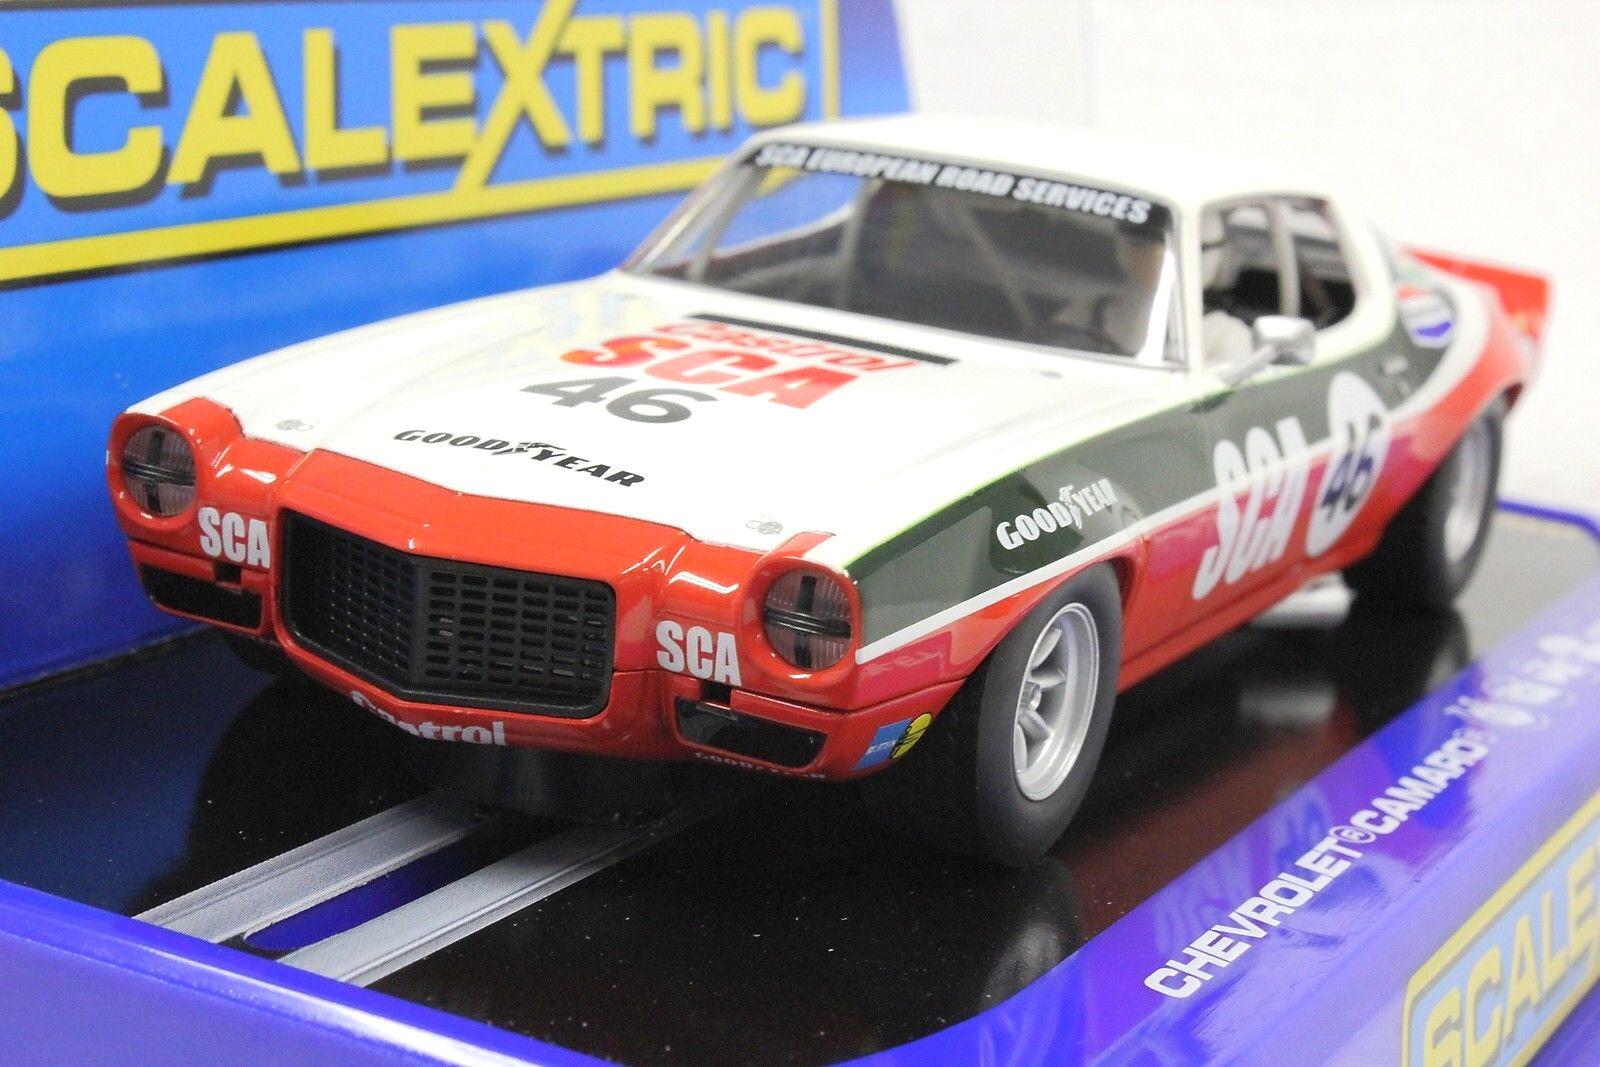 Scalextric C3316 1970 Chevrolet Camaro,  46 1 32 SLOT CAR  RMR